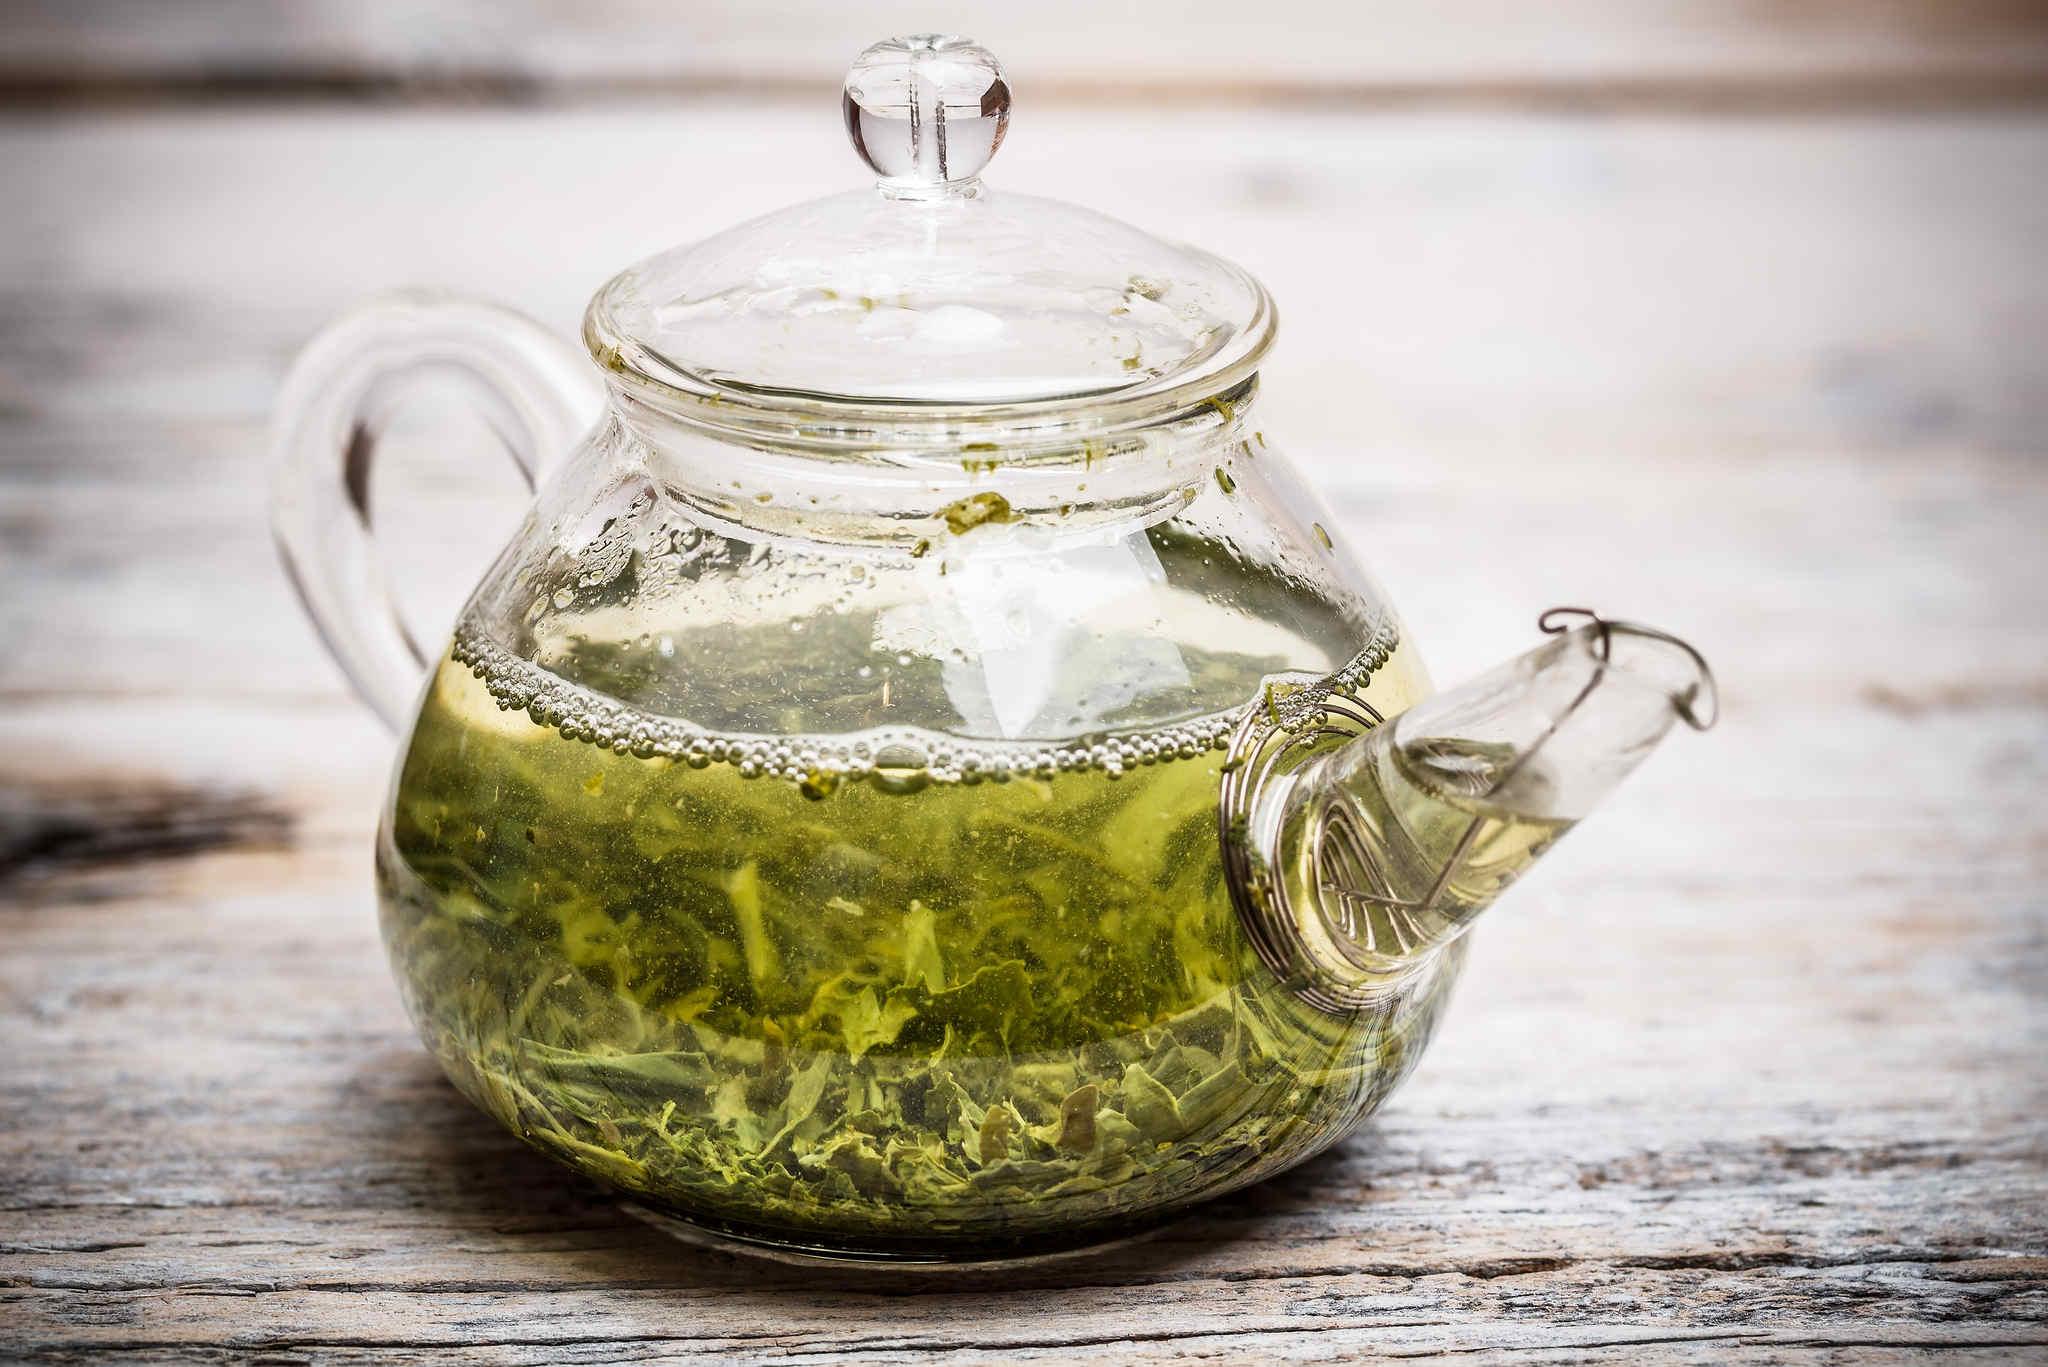 yeşil çay, kireçlenme tedavisi